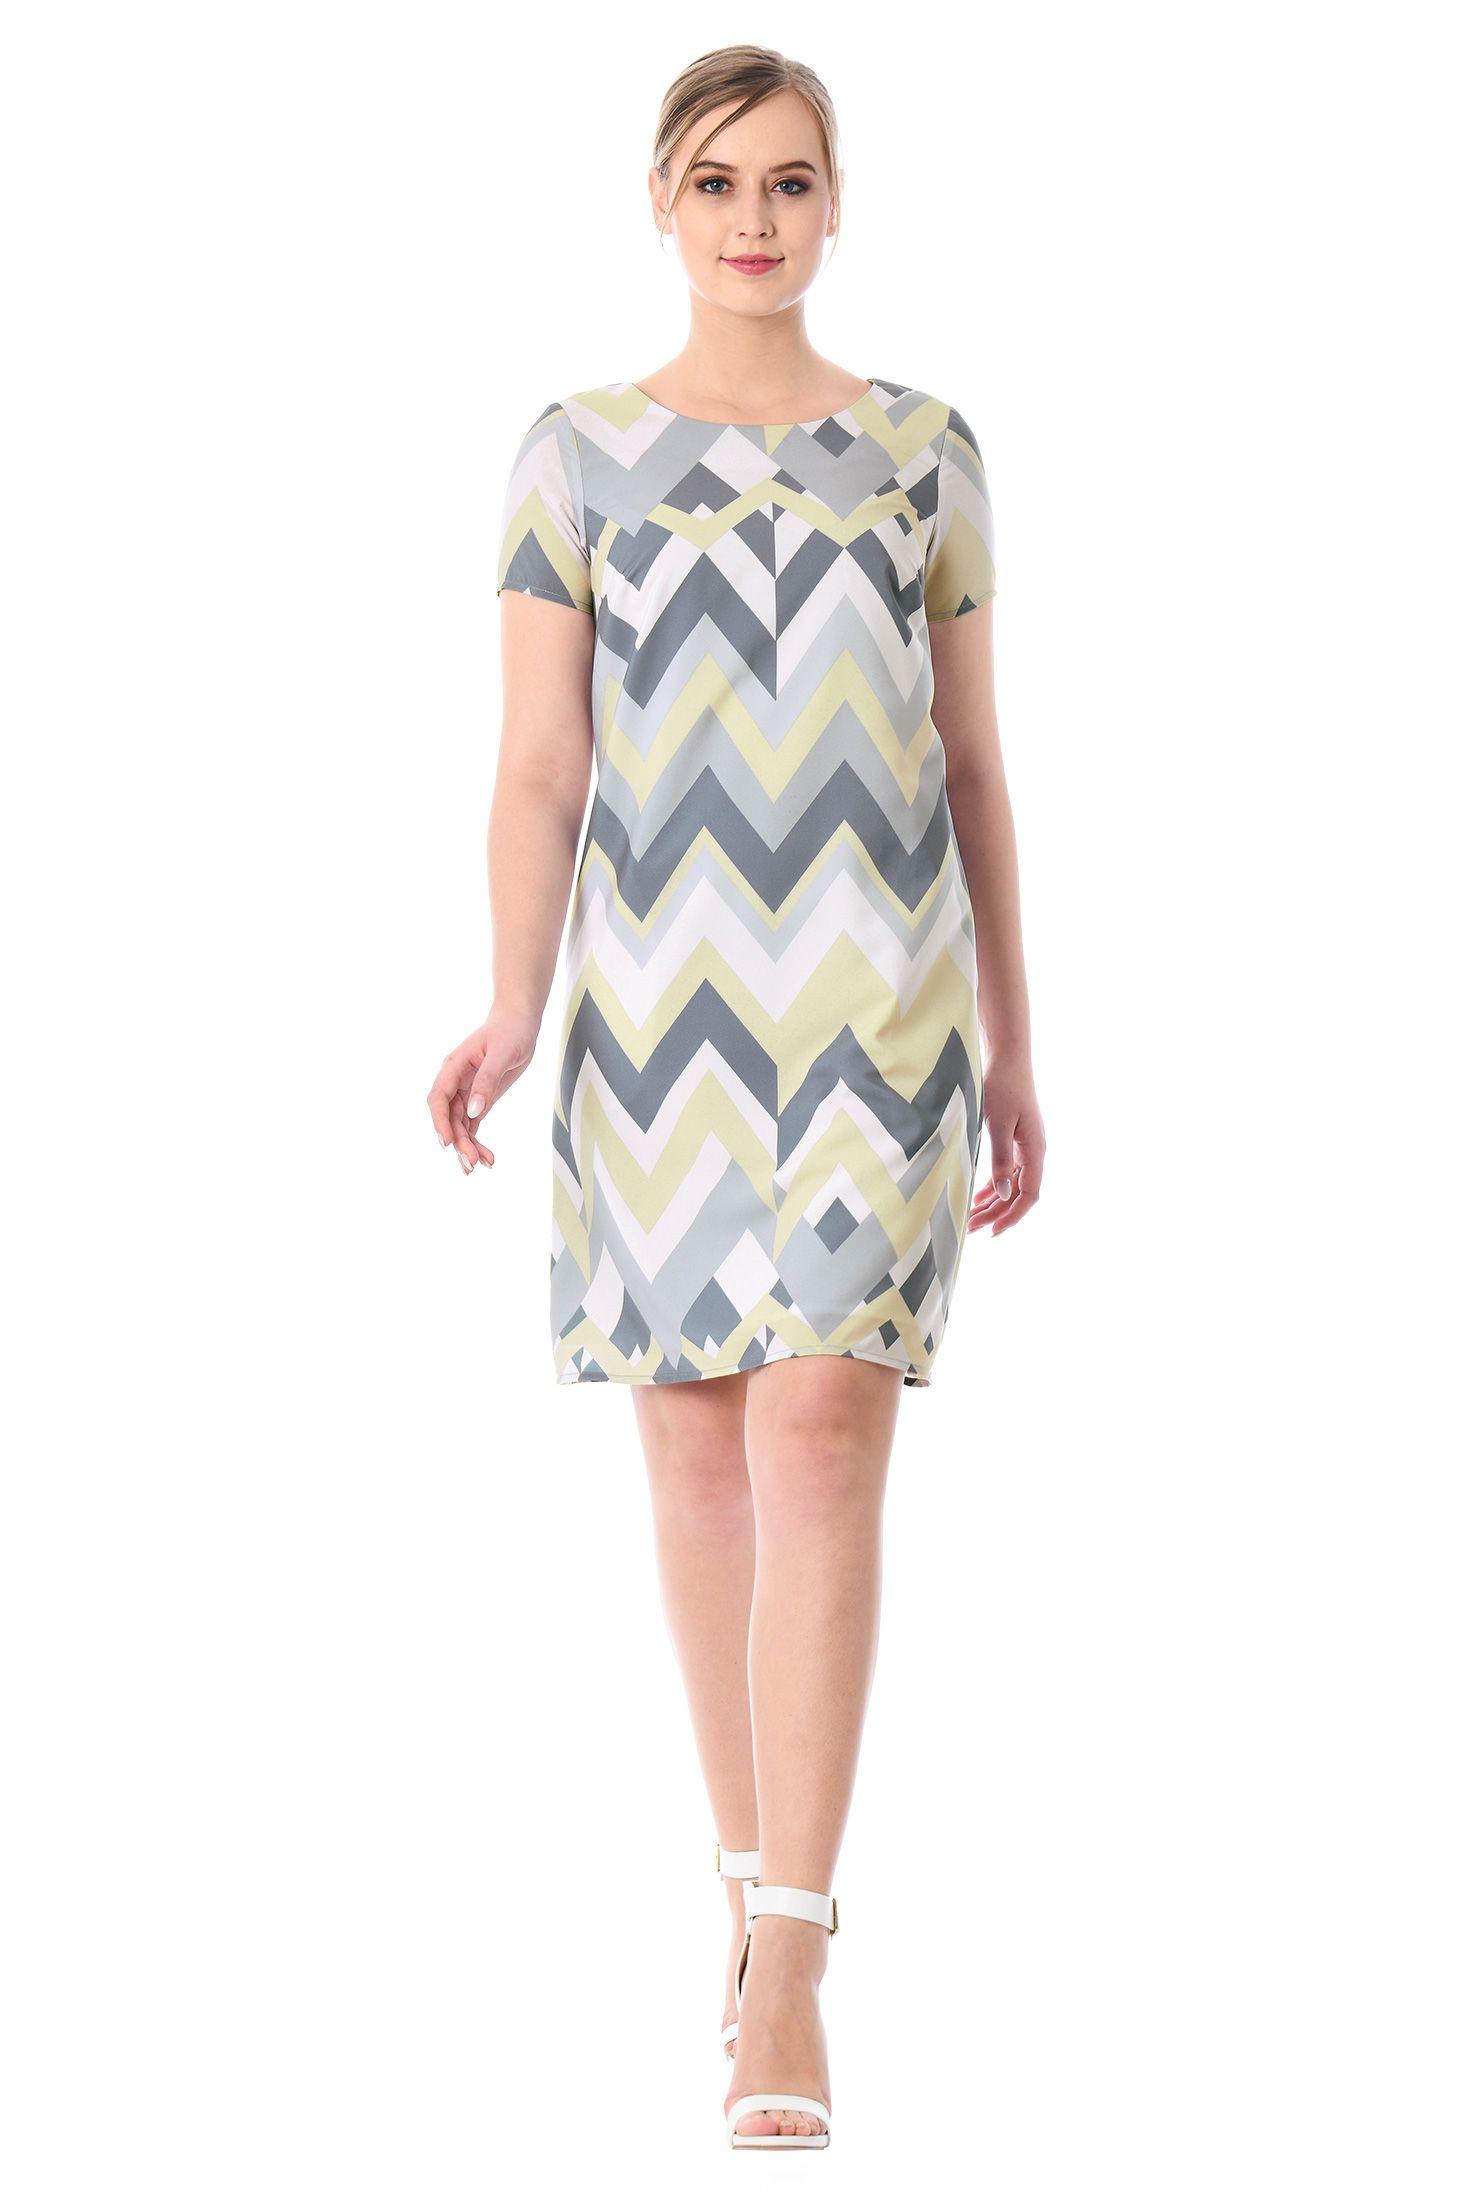 Eshakti Fashion Designer Dresses Designer Tops And Designer Skirts Womens Fashion Designers Ropa